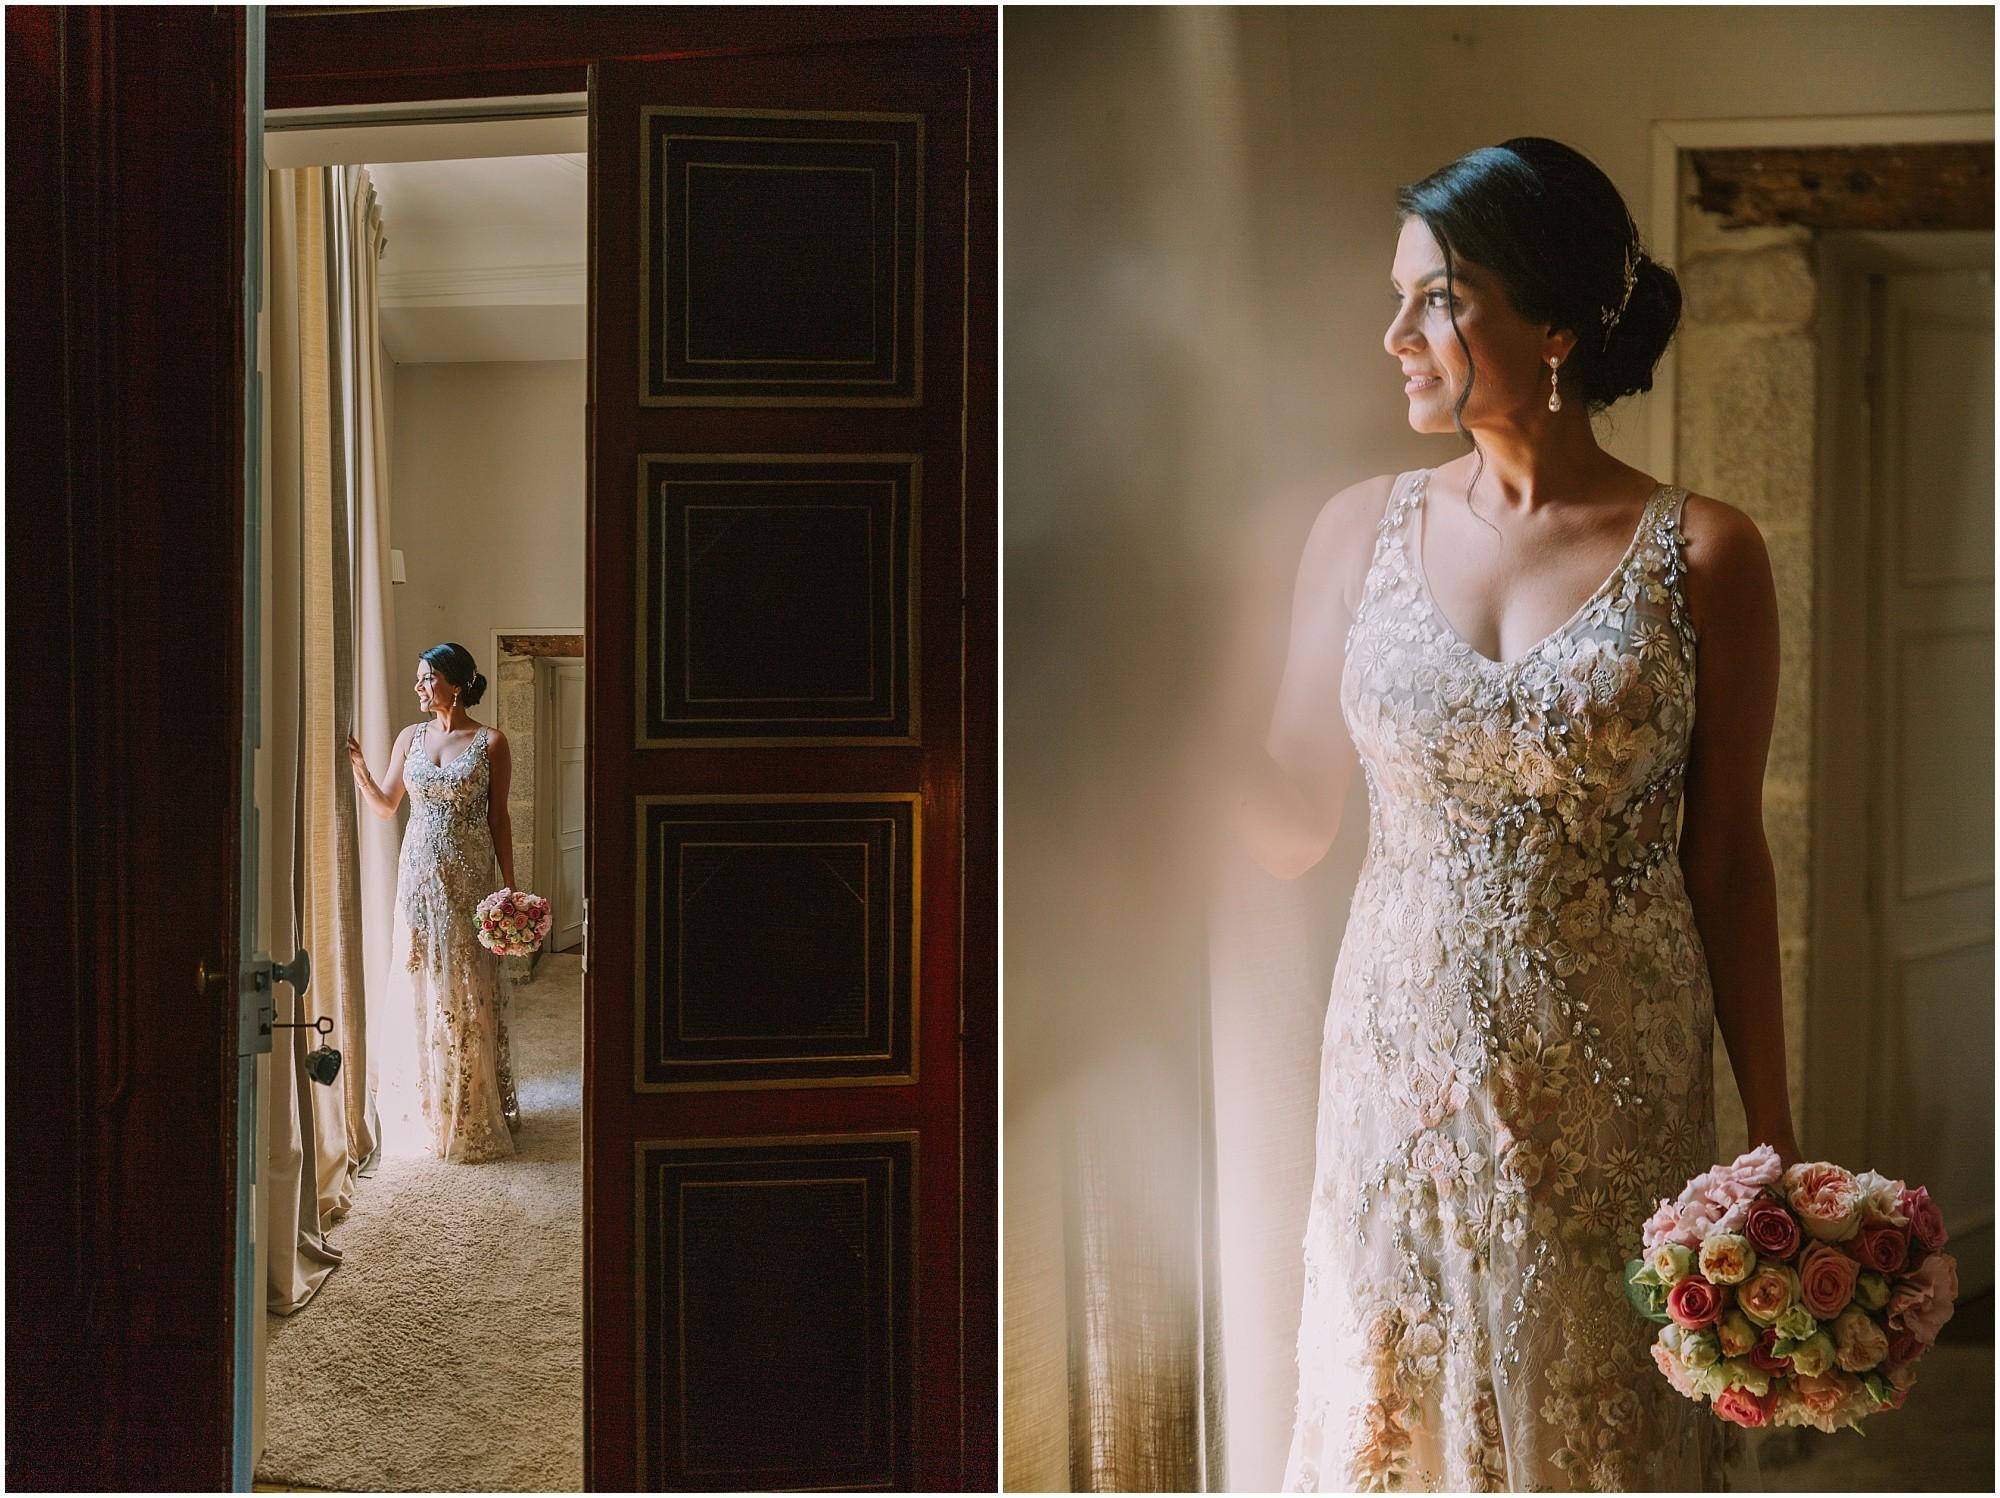 Kateryna-photos-photographer-mariage-chateau-saint-paterne-alencon-normandie-mayenne-le-mans_0038.jpg